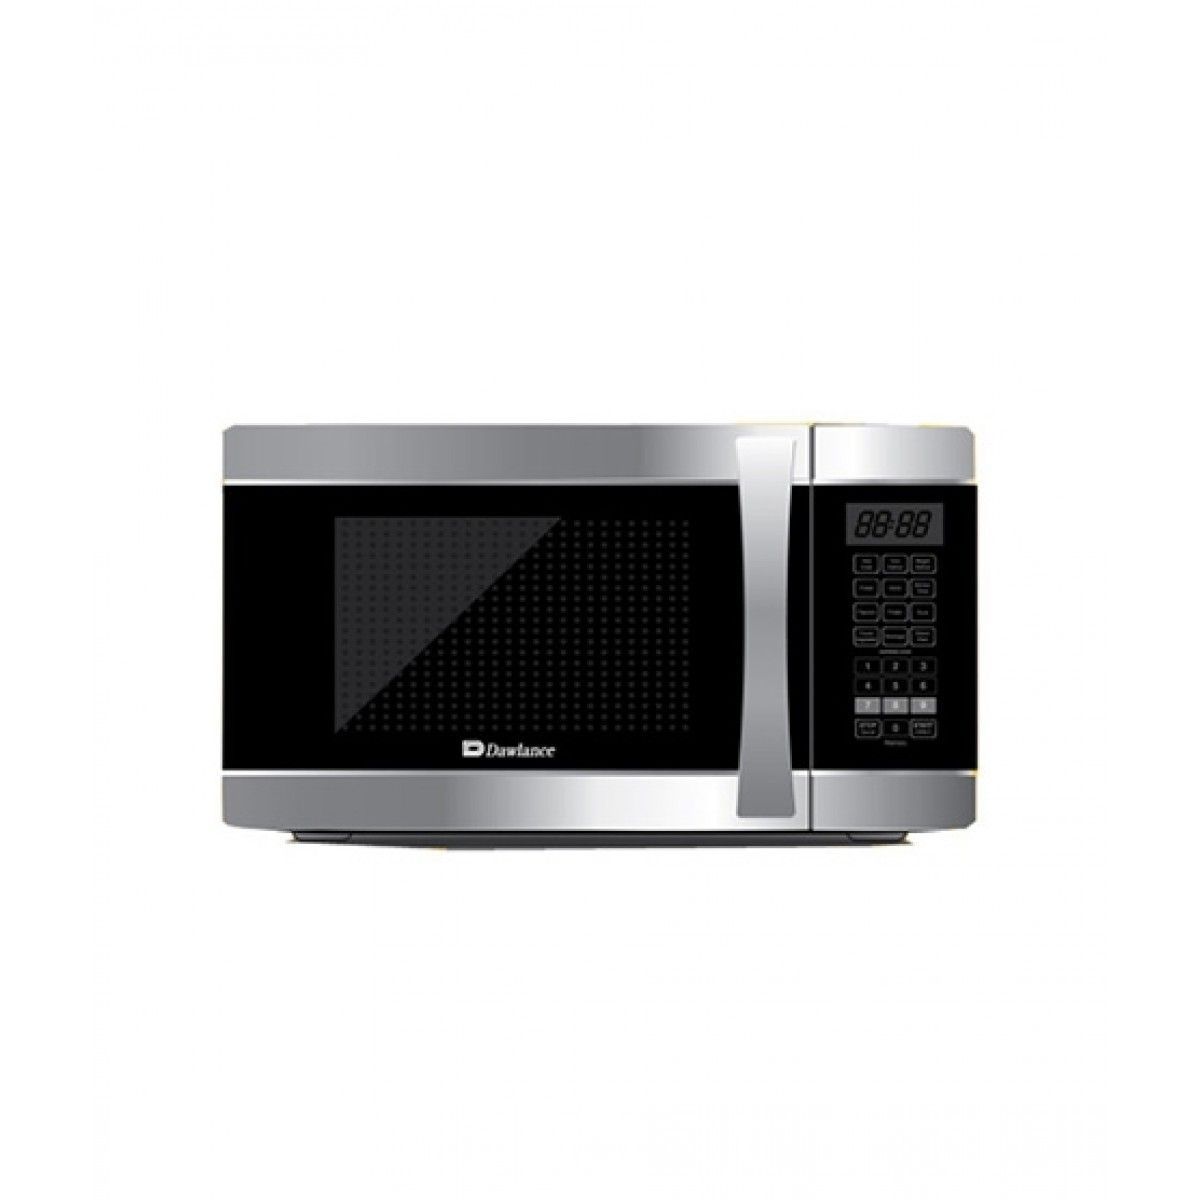 Dawlance DW-162-HZP Microwave Oven 62 Ltr